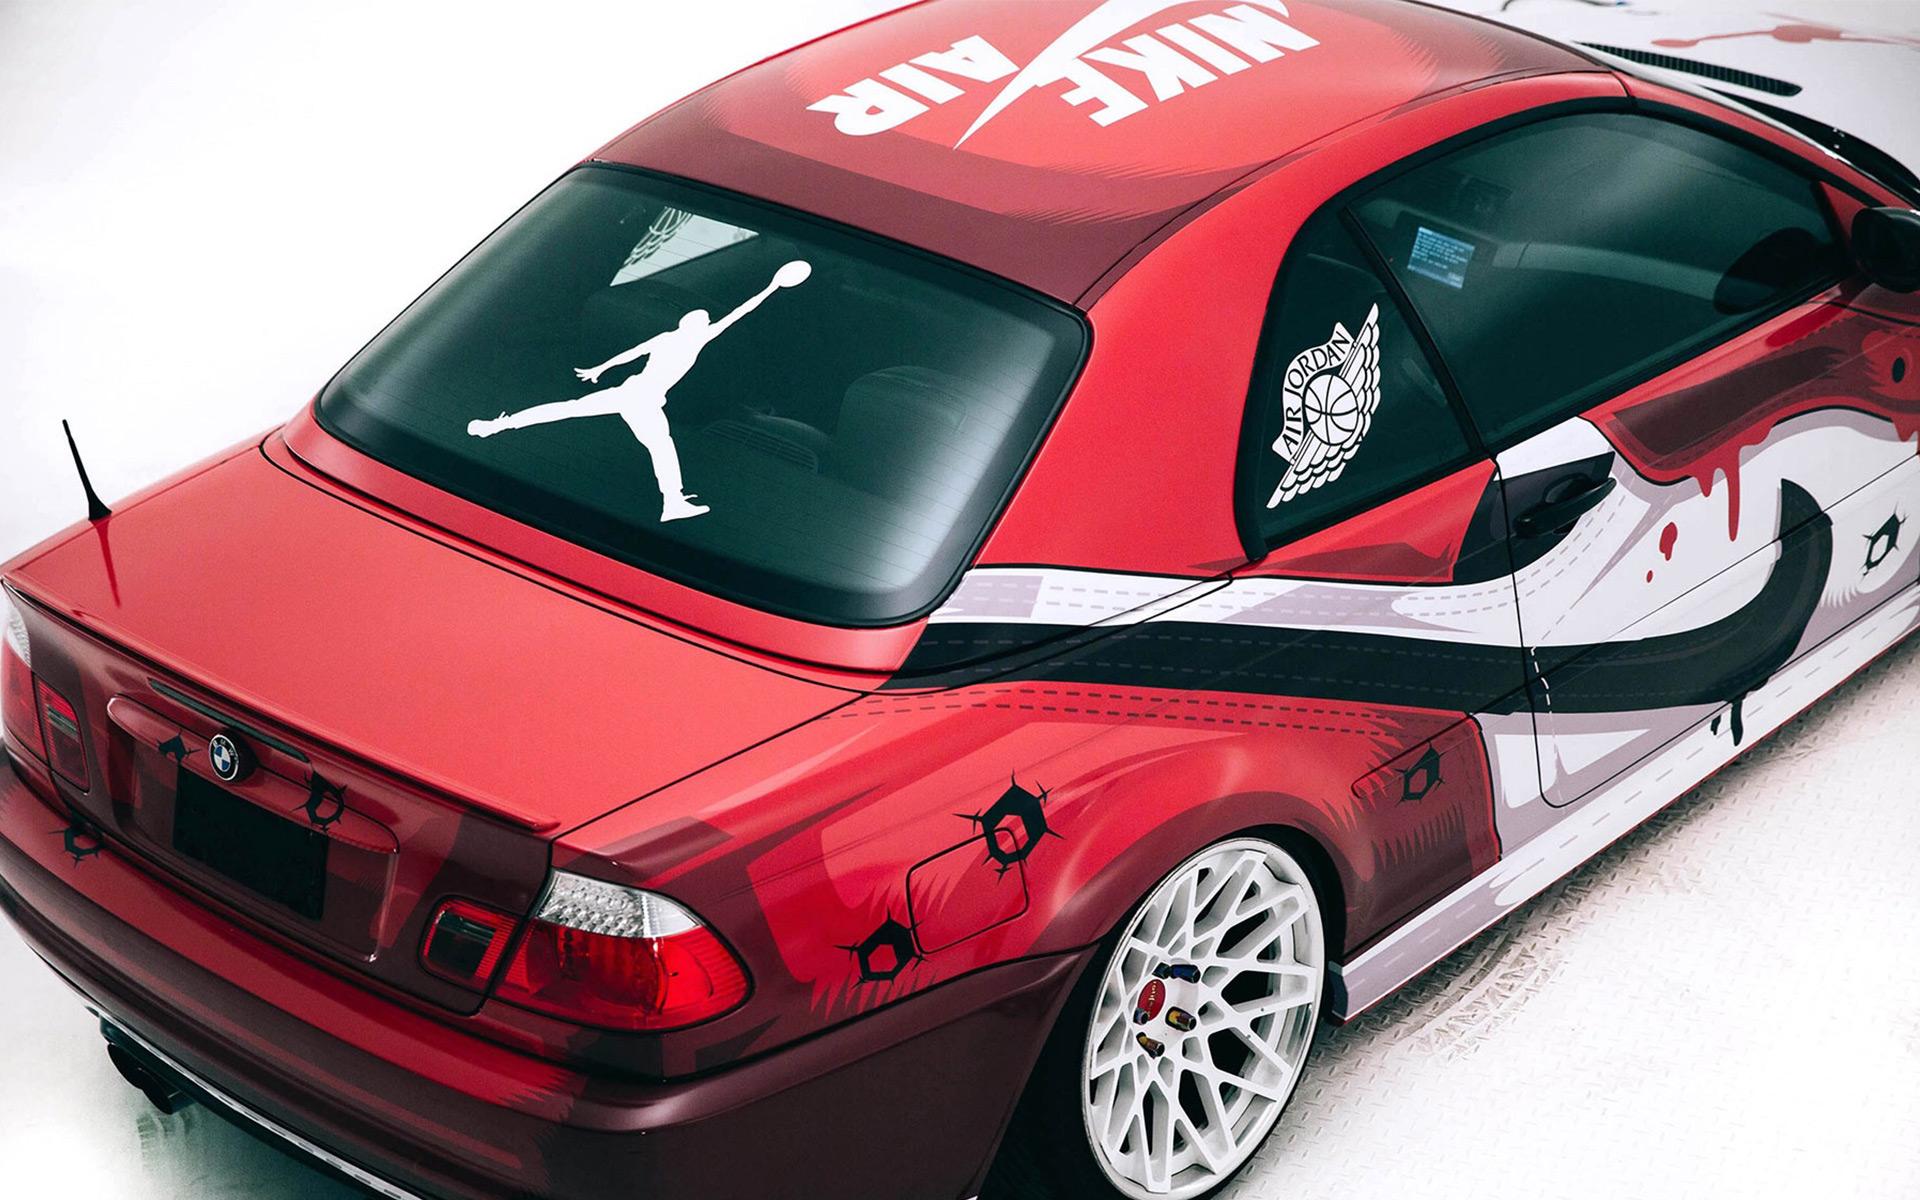 Air Jordan 1992 Blanco Bmw Y6wIdj0jD